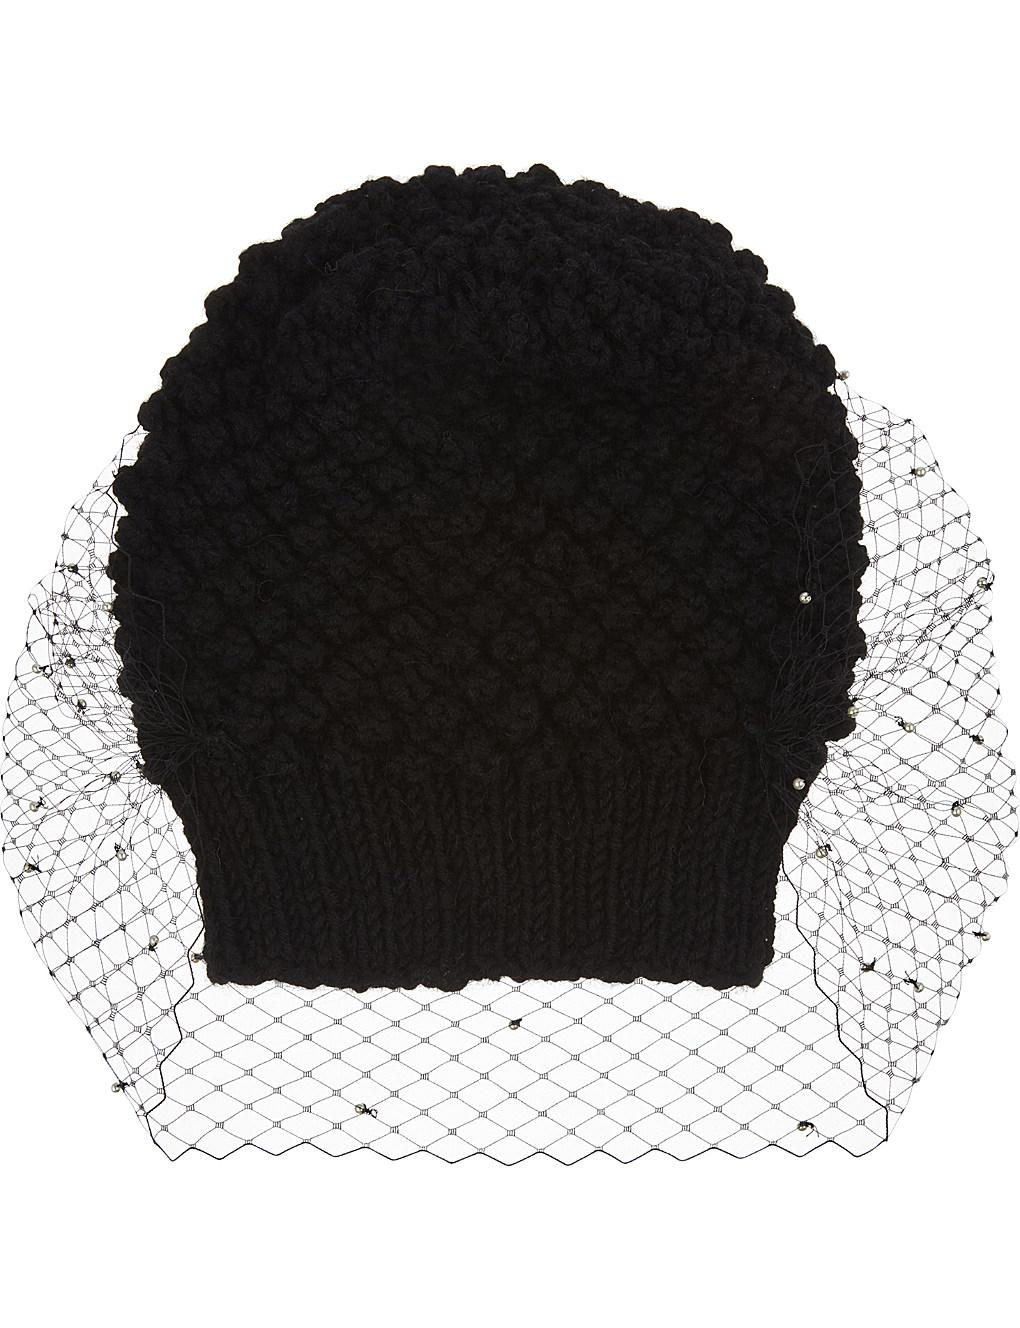 11020cb057e8b Jennifer Behr Embellished Alpaca Veiled Beanie Hat